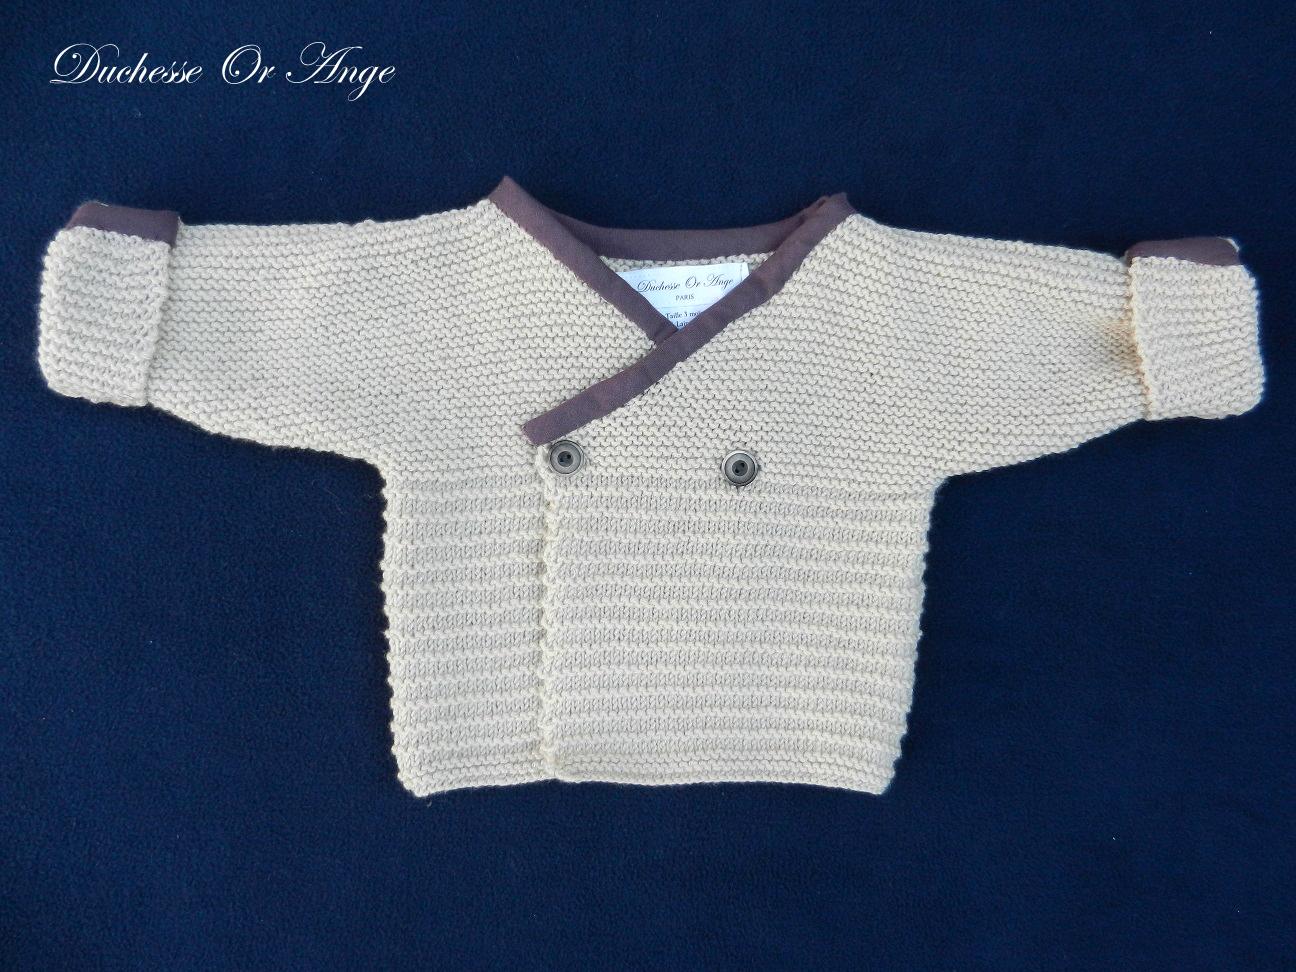 Doa 135 a gilet beige bebe laine 3 mois baby beige cardigan 3 months old